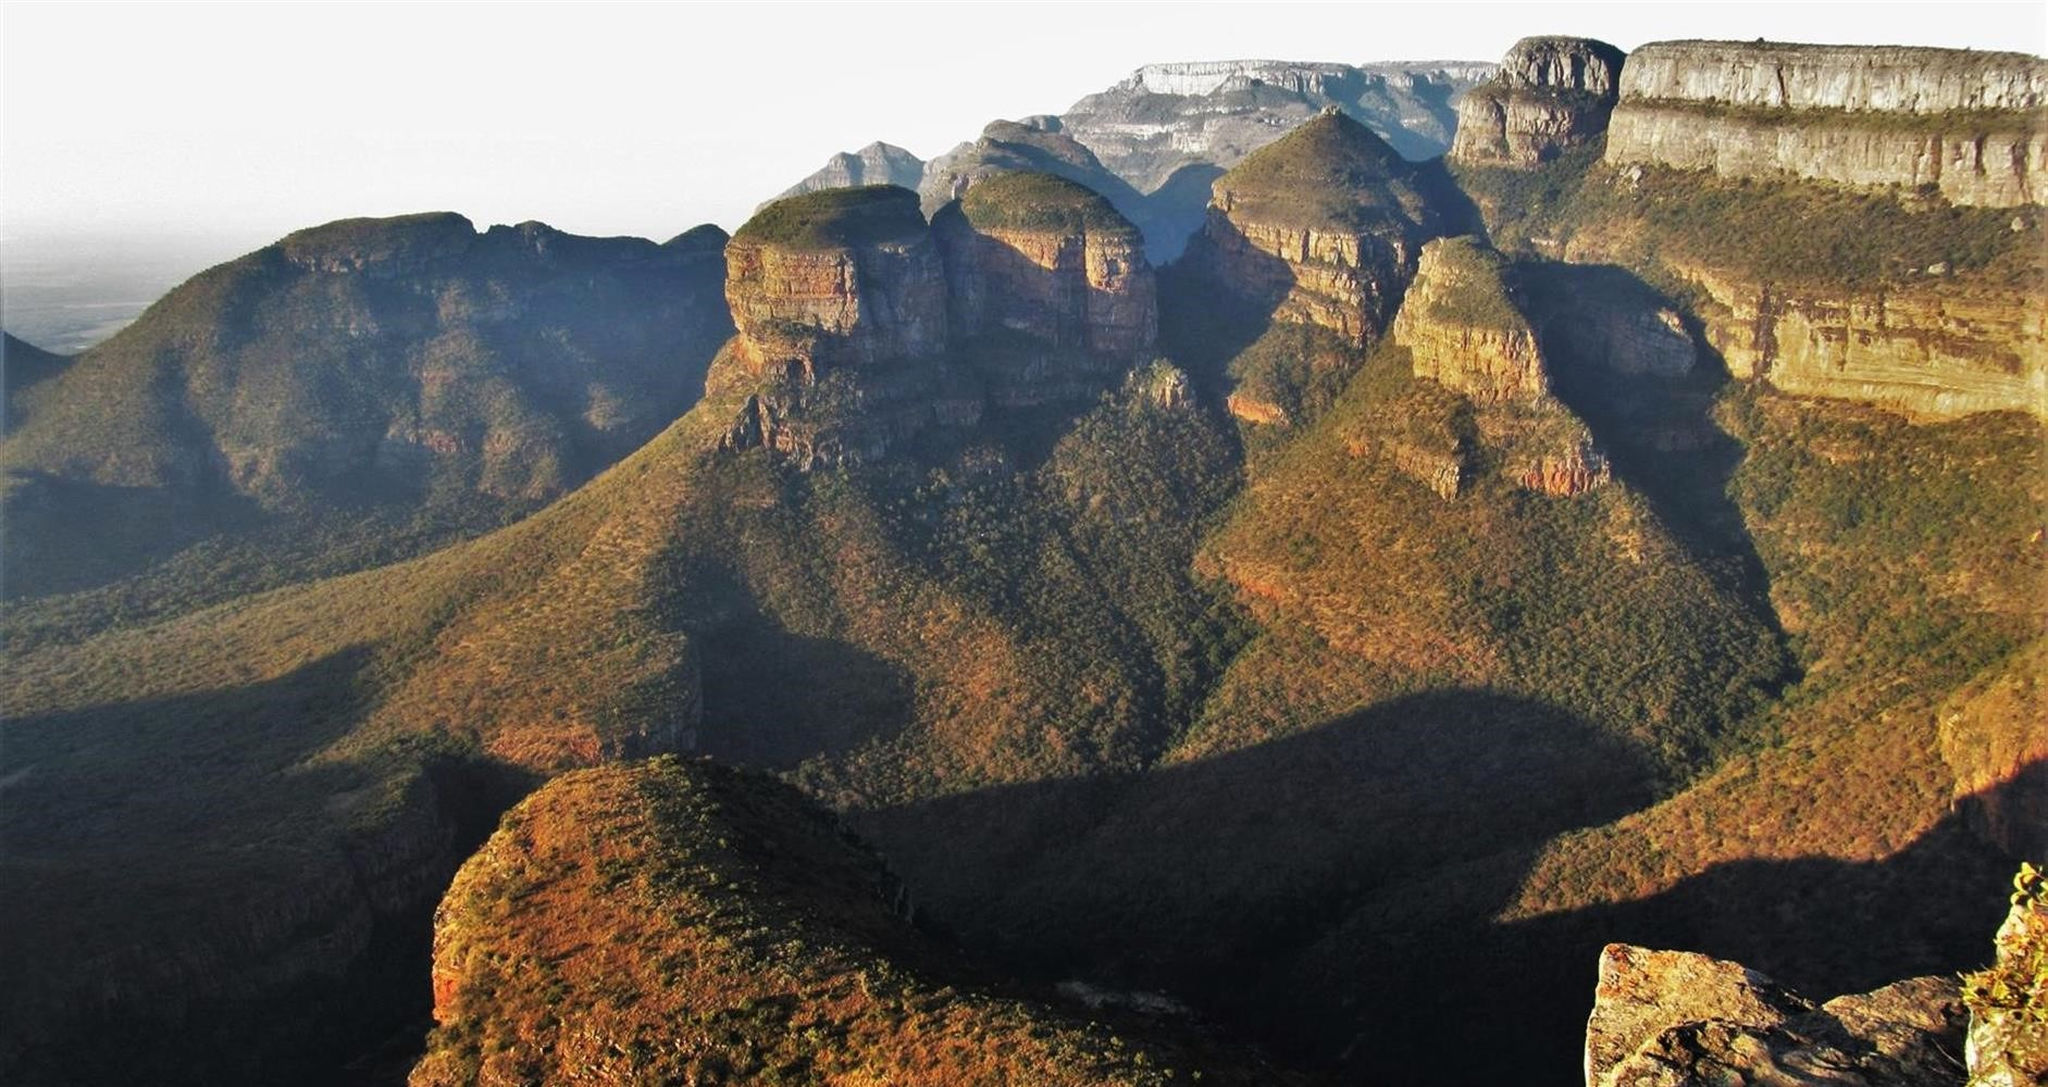 view-landscapes-mountains-graskop_greater_kruger_area